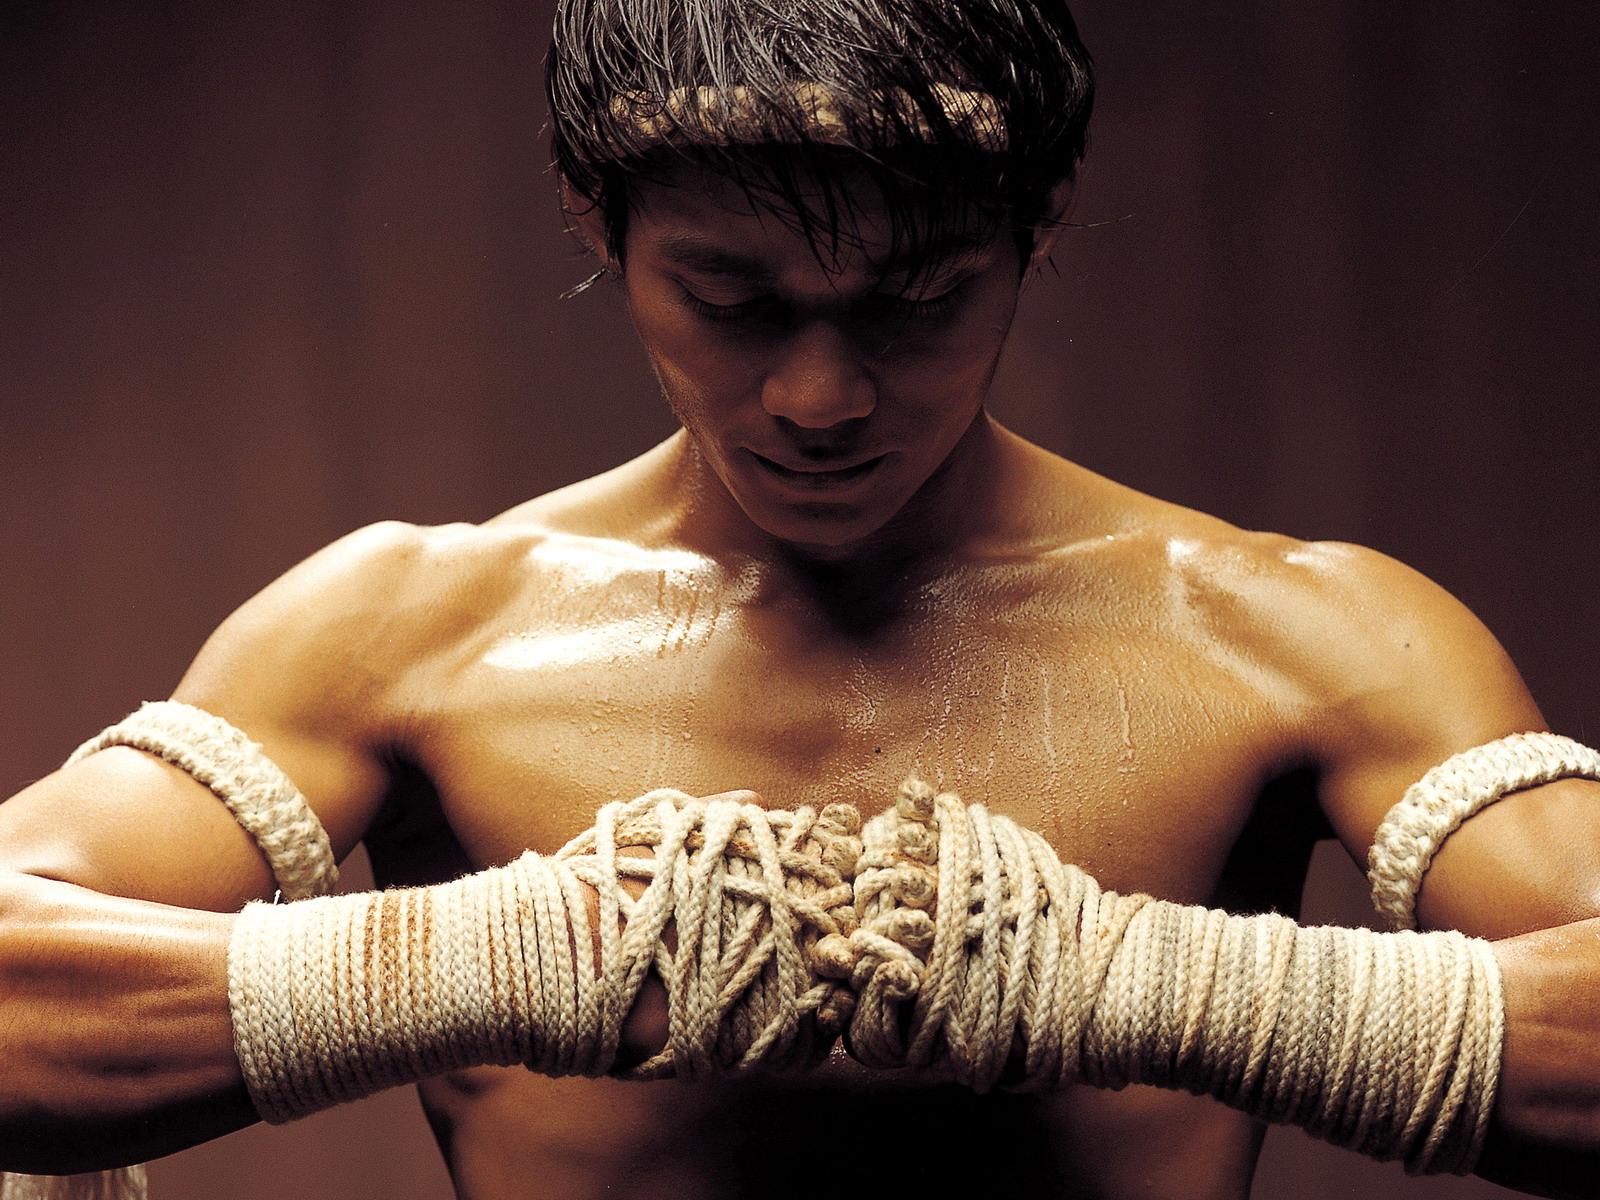 http://3.bp.blogspot.com/-sl7WEfk2wFc/TxQxPvwmz0I/AAAAAAAADLs/MS9NtFDTA2g/s1600/Movies_Movies_O__Ong-bak_010376_.jpg